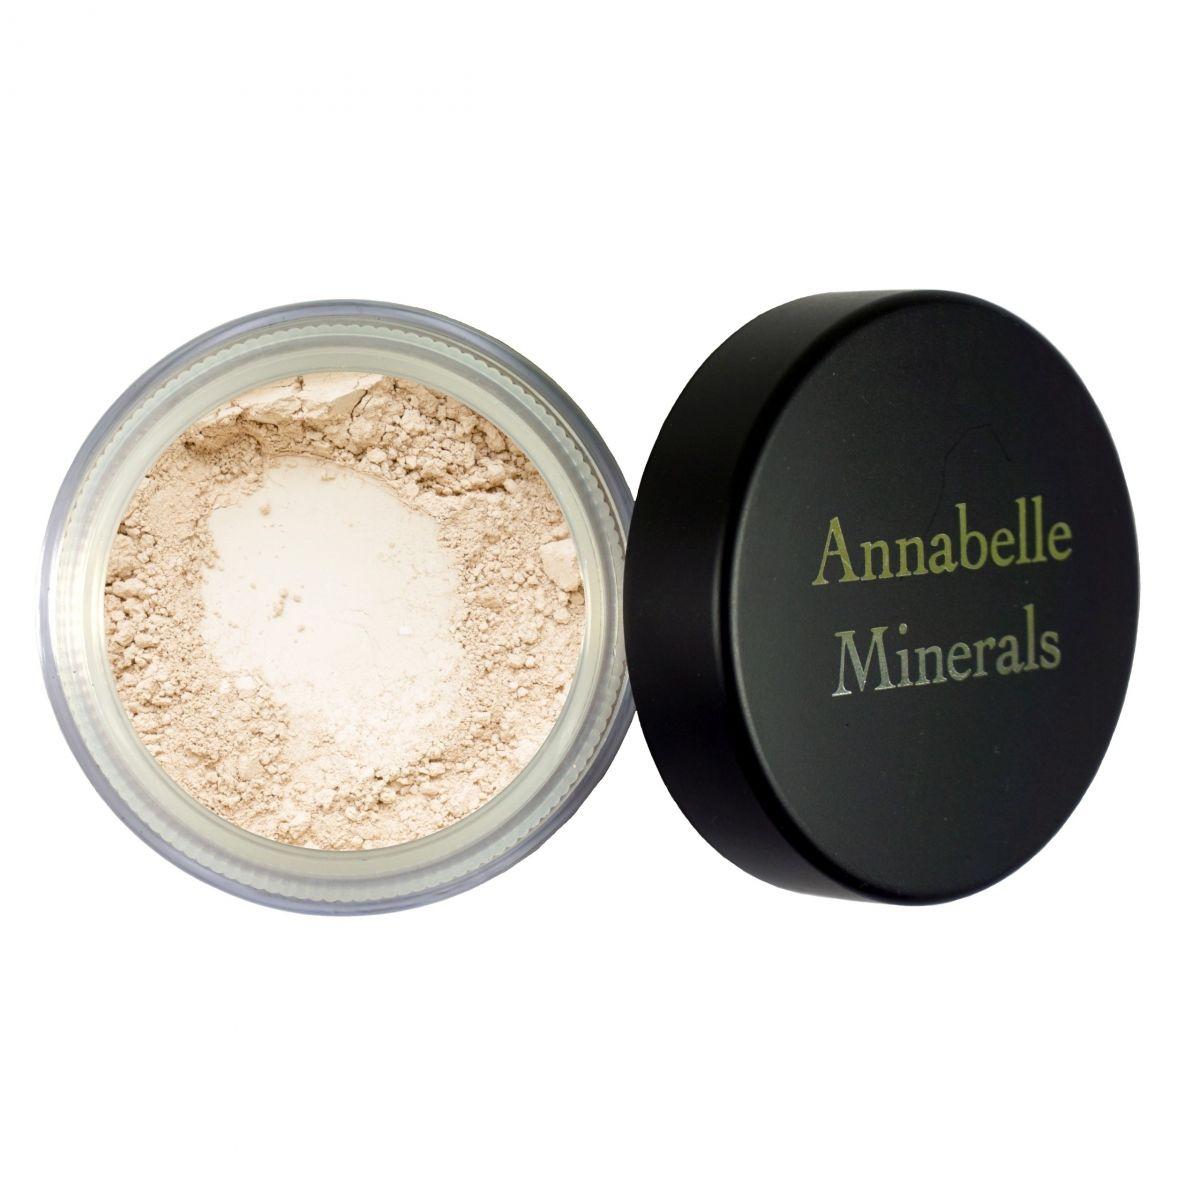 Podkład mineralny - kryjący Natural Light - 4g - Annabelle Minerals